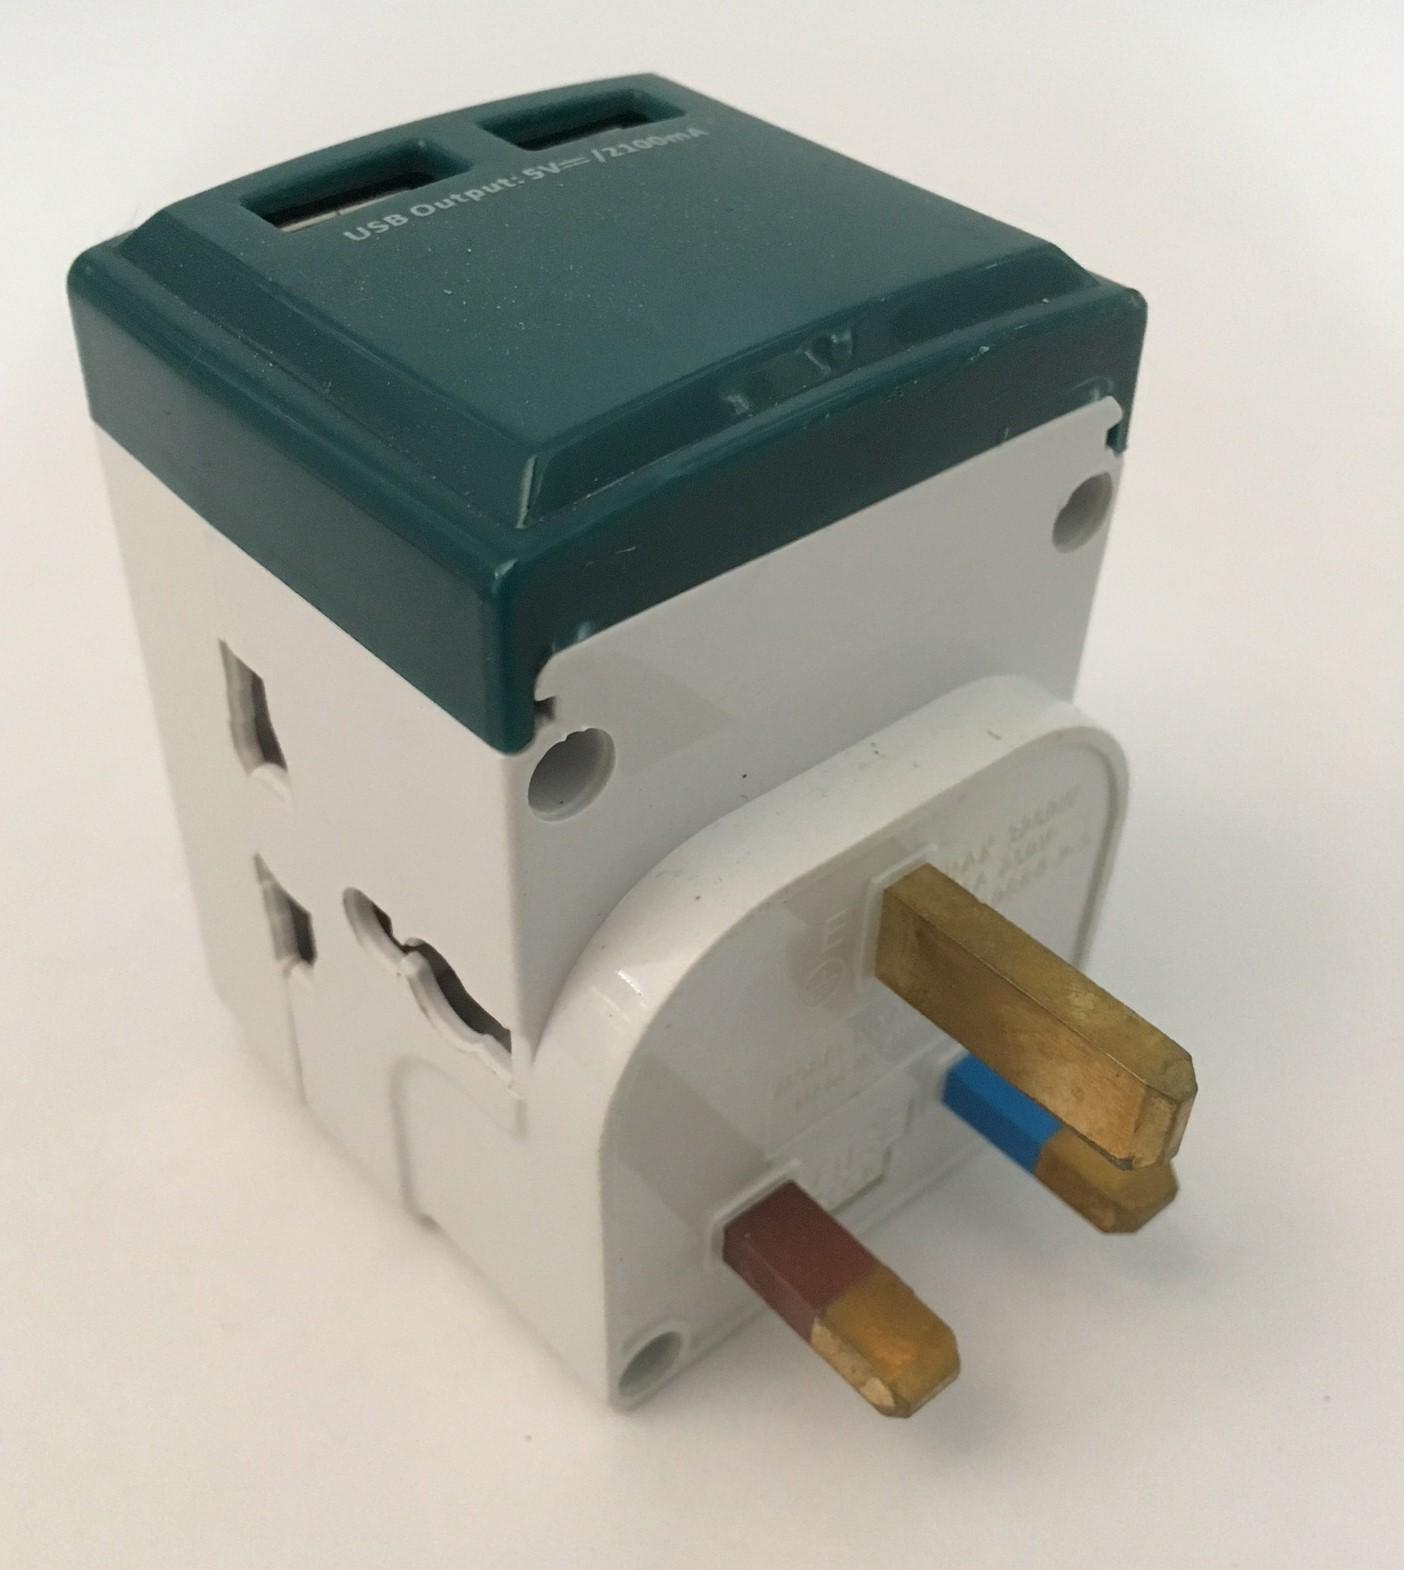 3 Way Universal International Adaptor With Fast Charging 2 USB